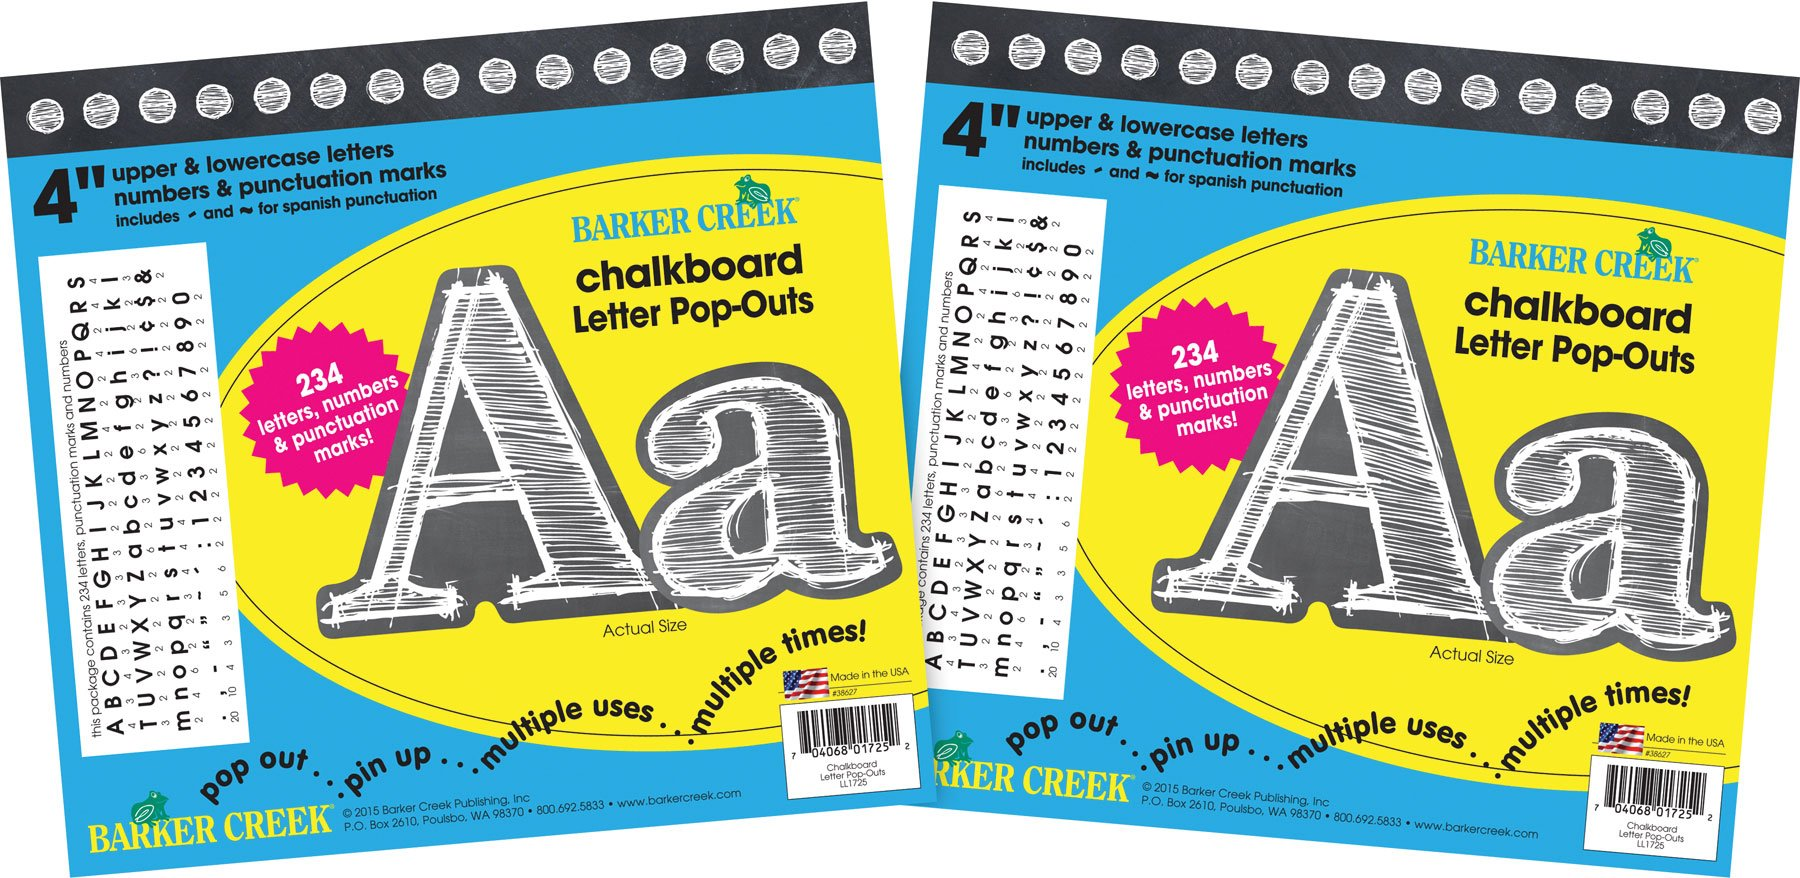 Barker Creek 4'' Letter Pop-Outs 2 Pack - Chalkboard (BC3646) by BARKER CREEK